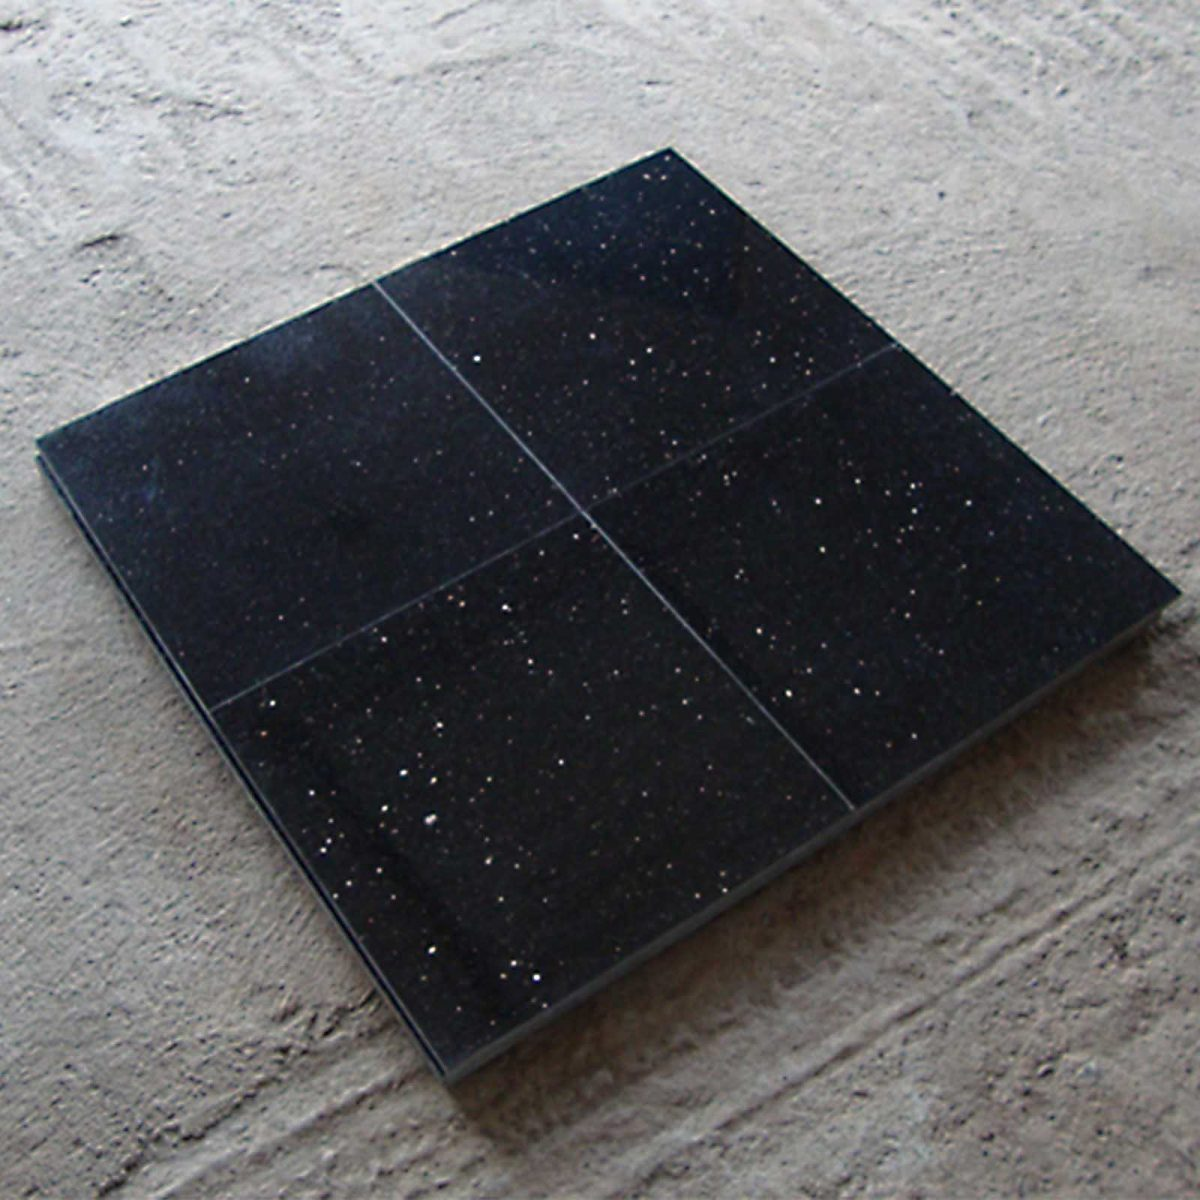 Black Galaxy Granite Countertop Vanitytop Slab Tile Block Monument